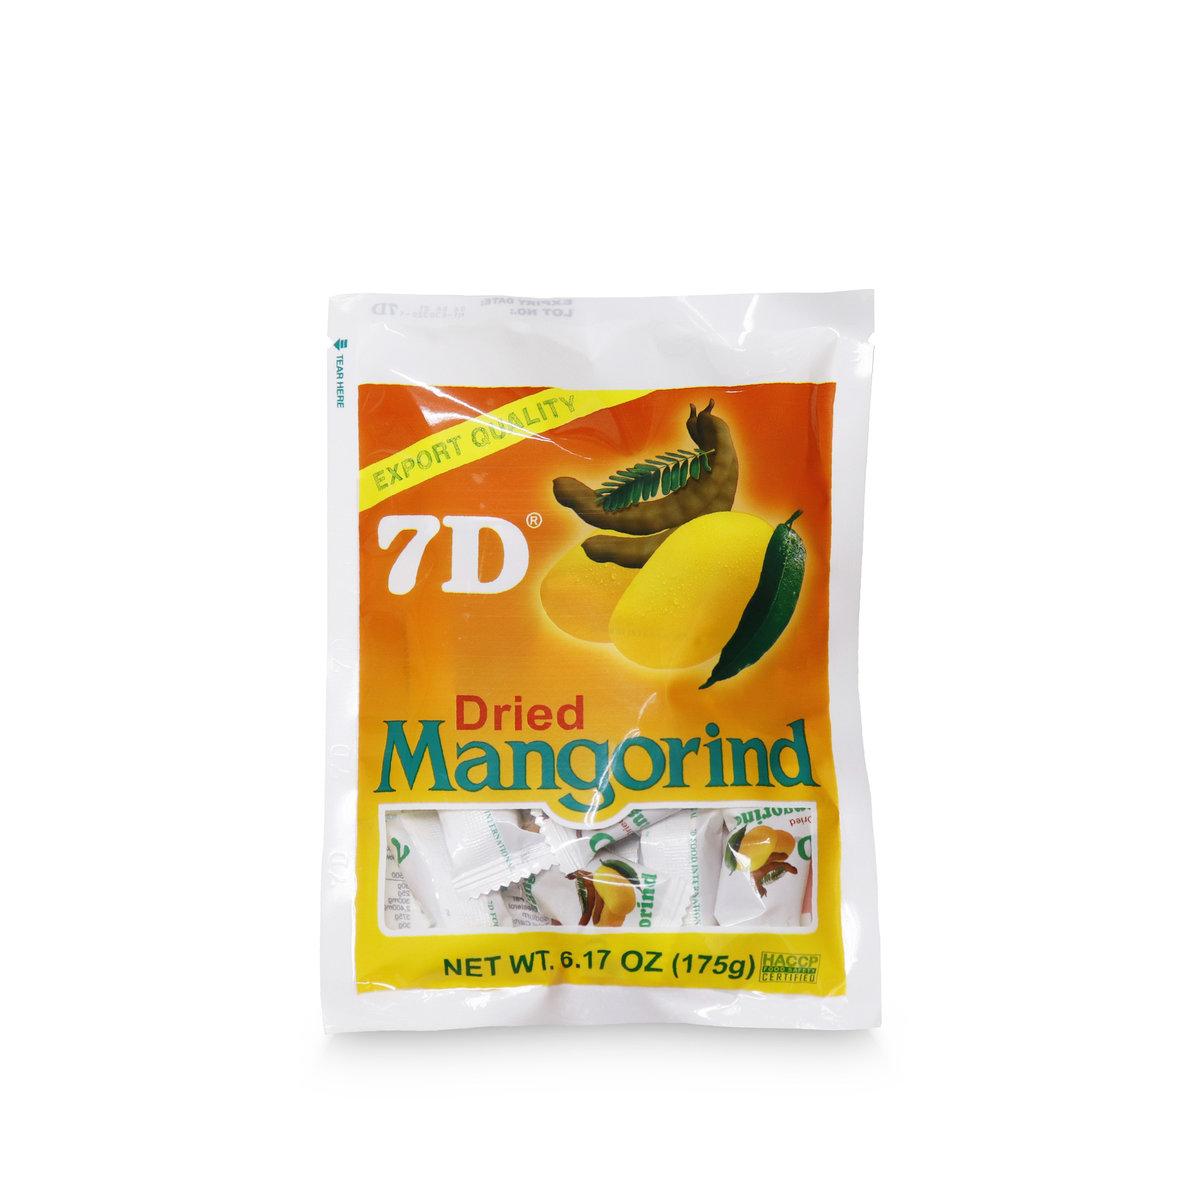 7D Dried Mangorind